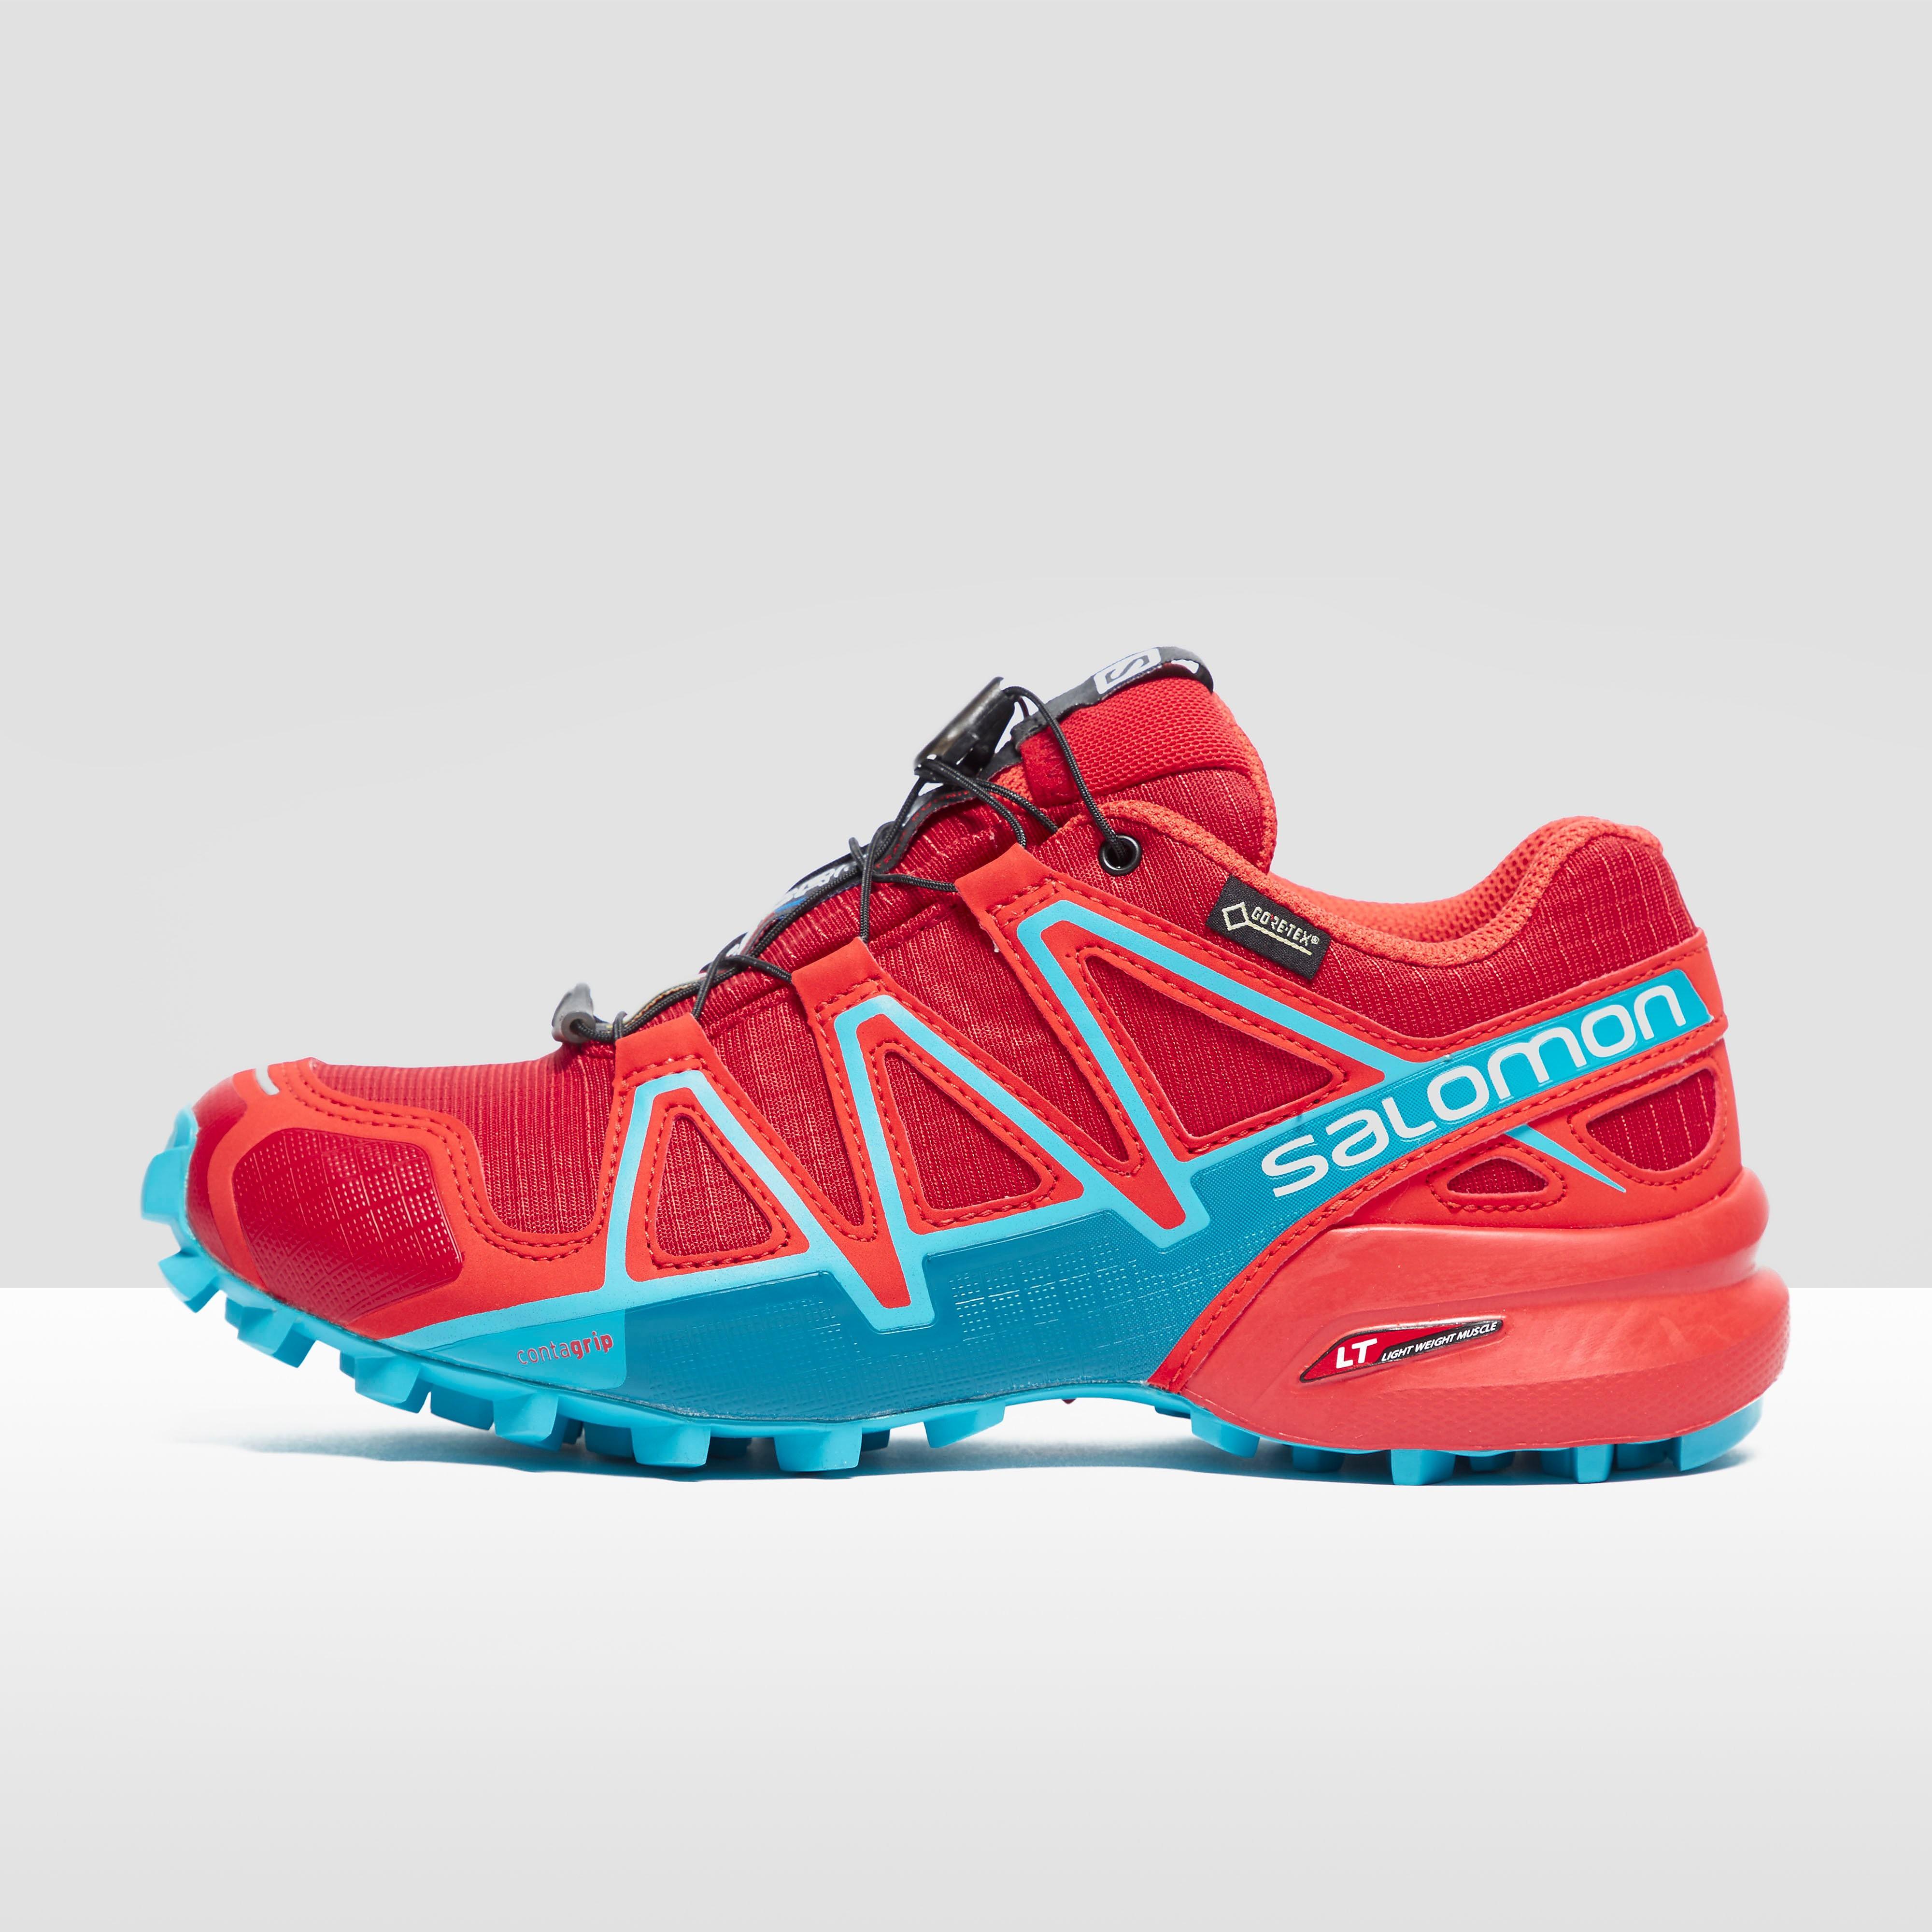 Salomon Speedcross 4 GTX Women's Trail Running Shoes